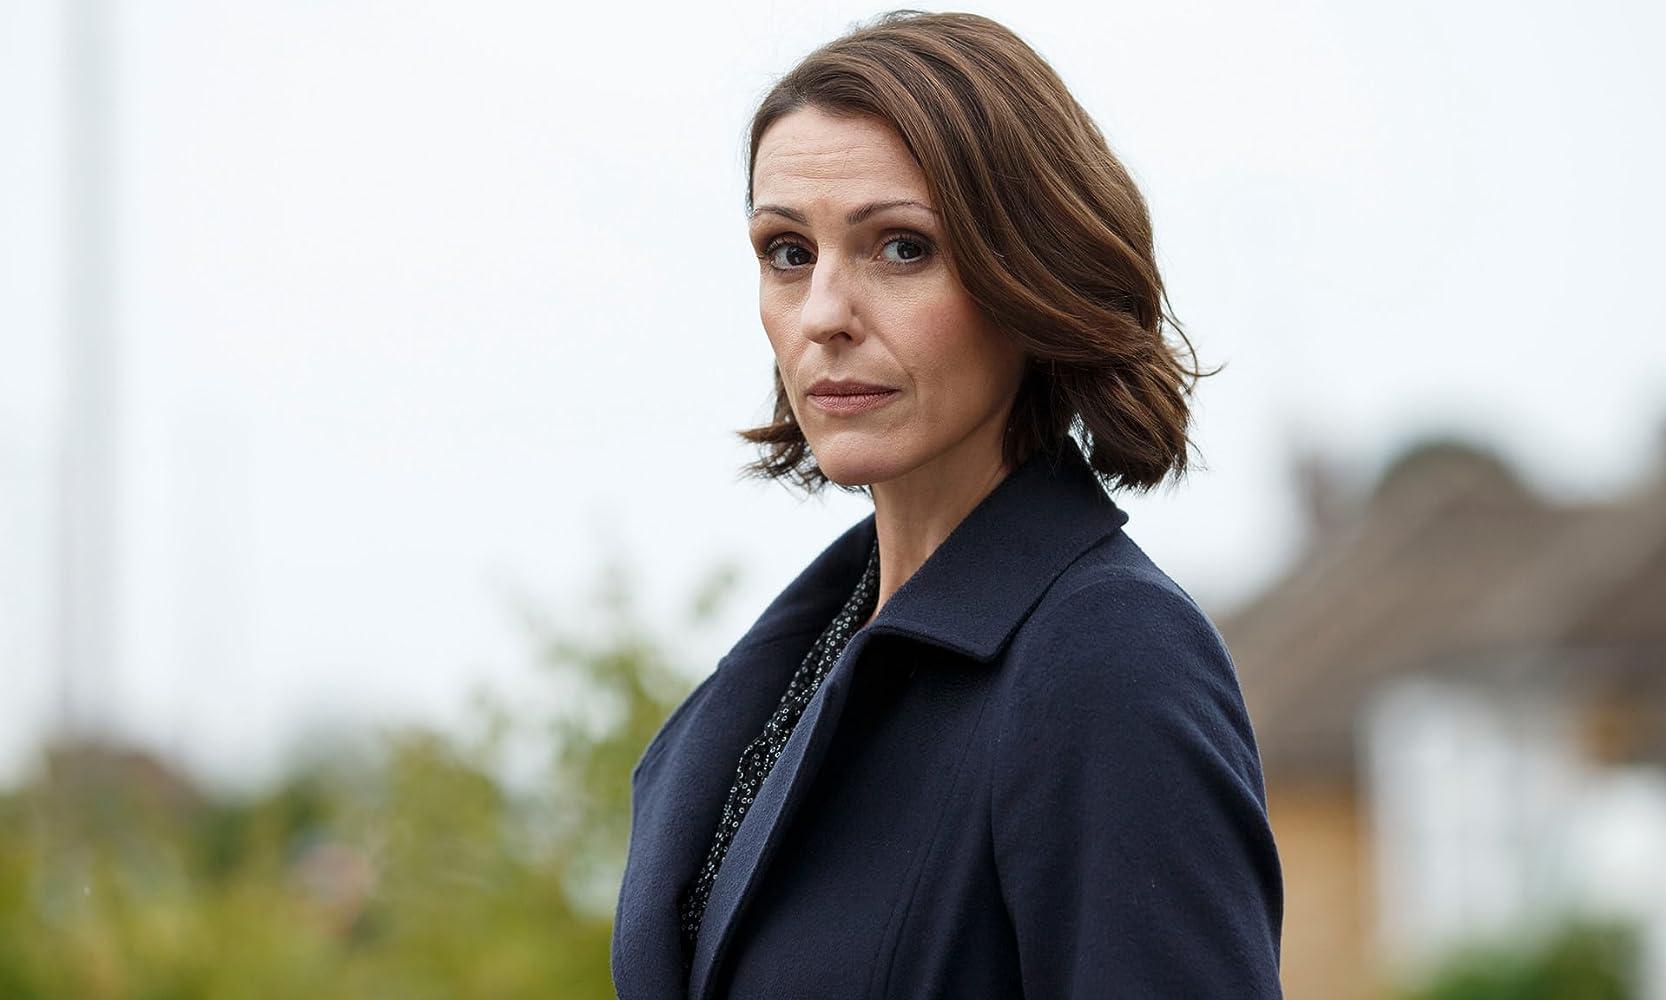 Doctor Foster: Temporada 1 - Netflix